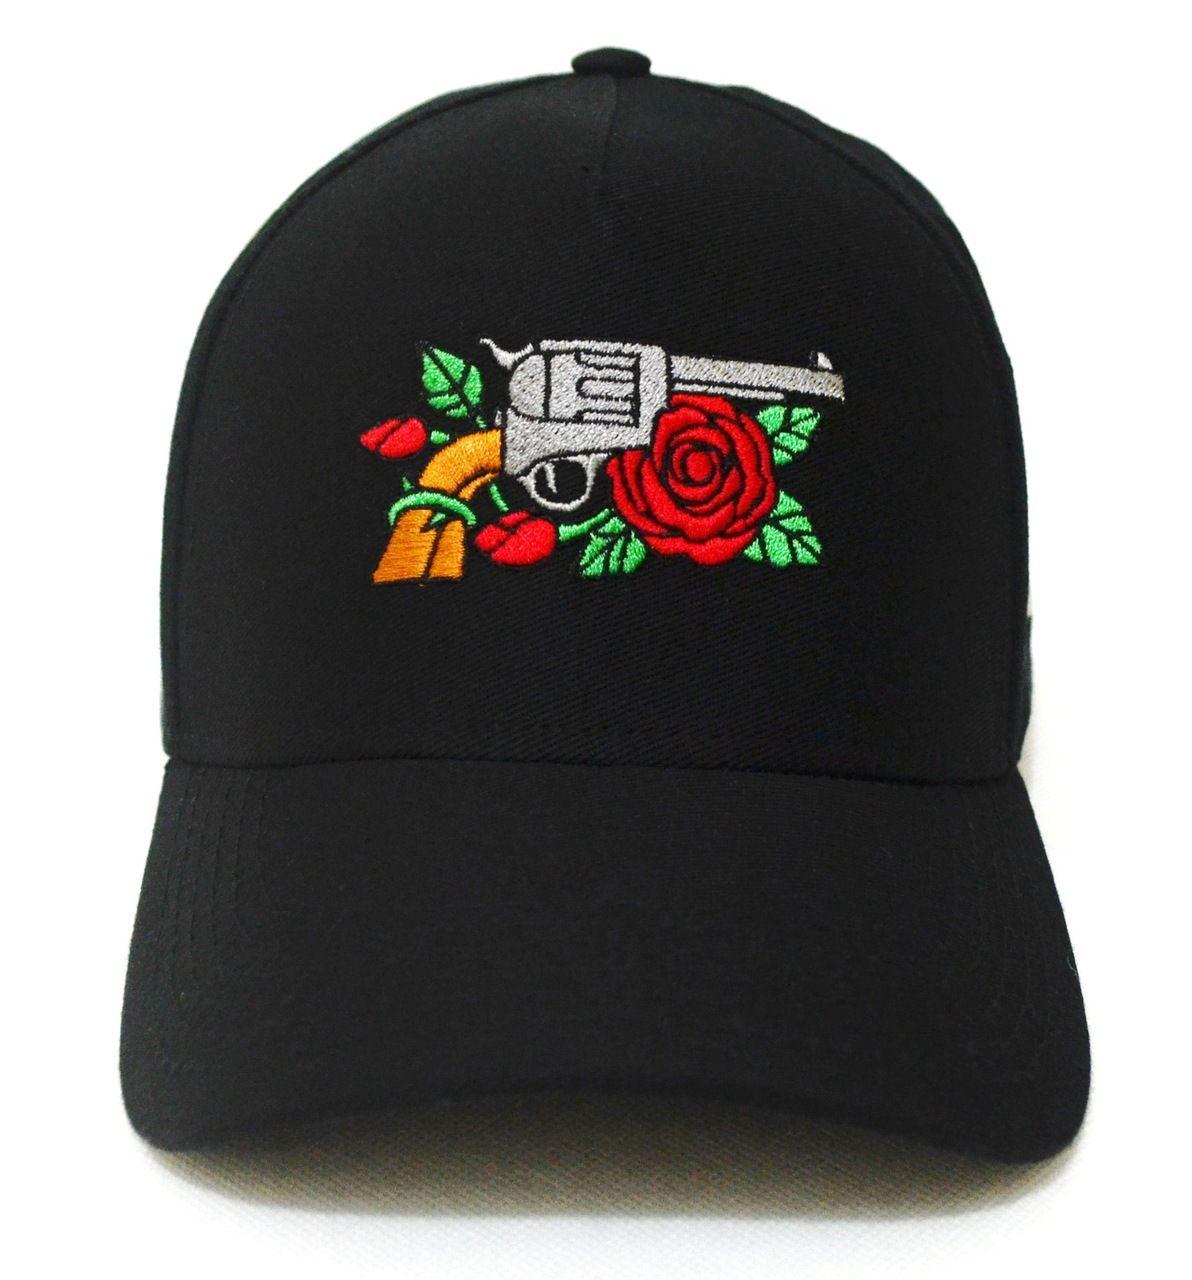 Boné Armas e Rosas Preto Tiger Aba Curva Snapback c64a0527aec